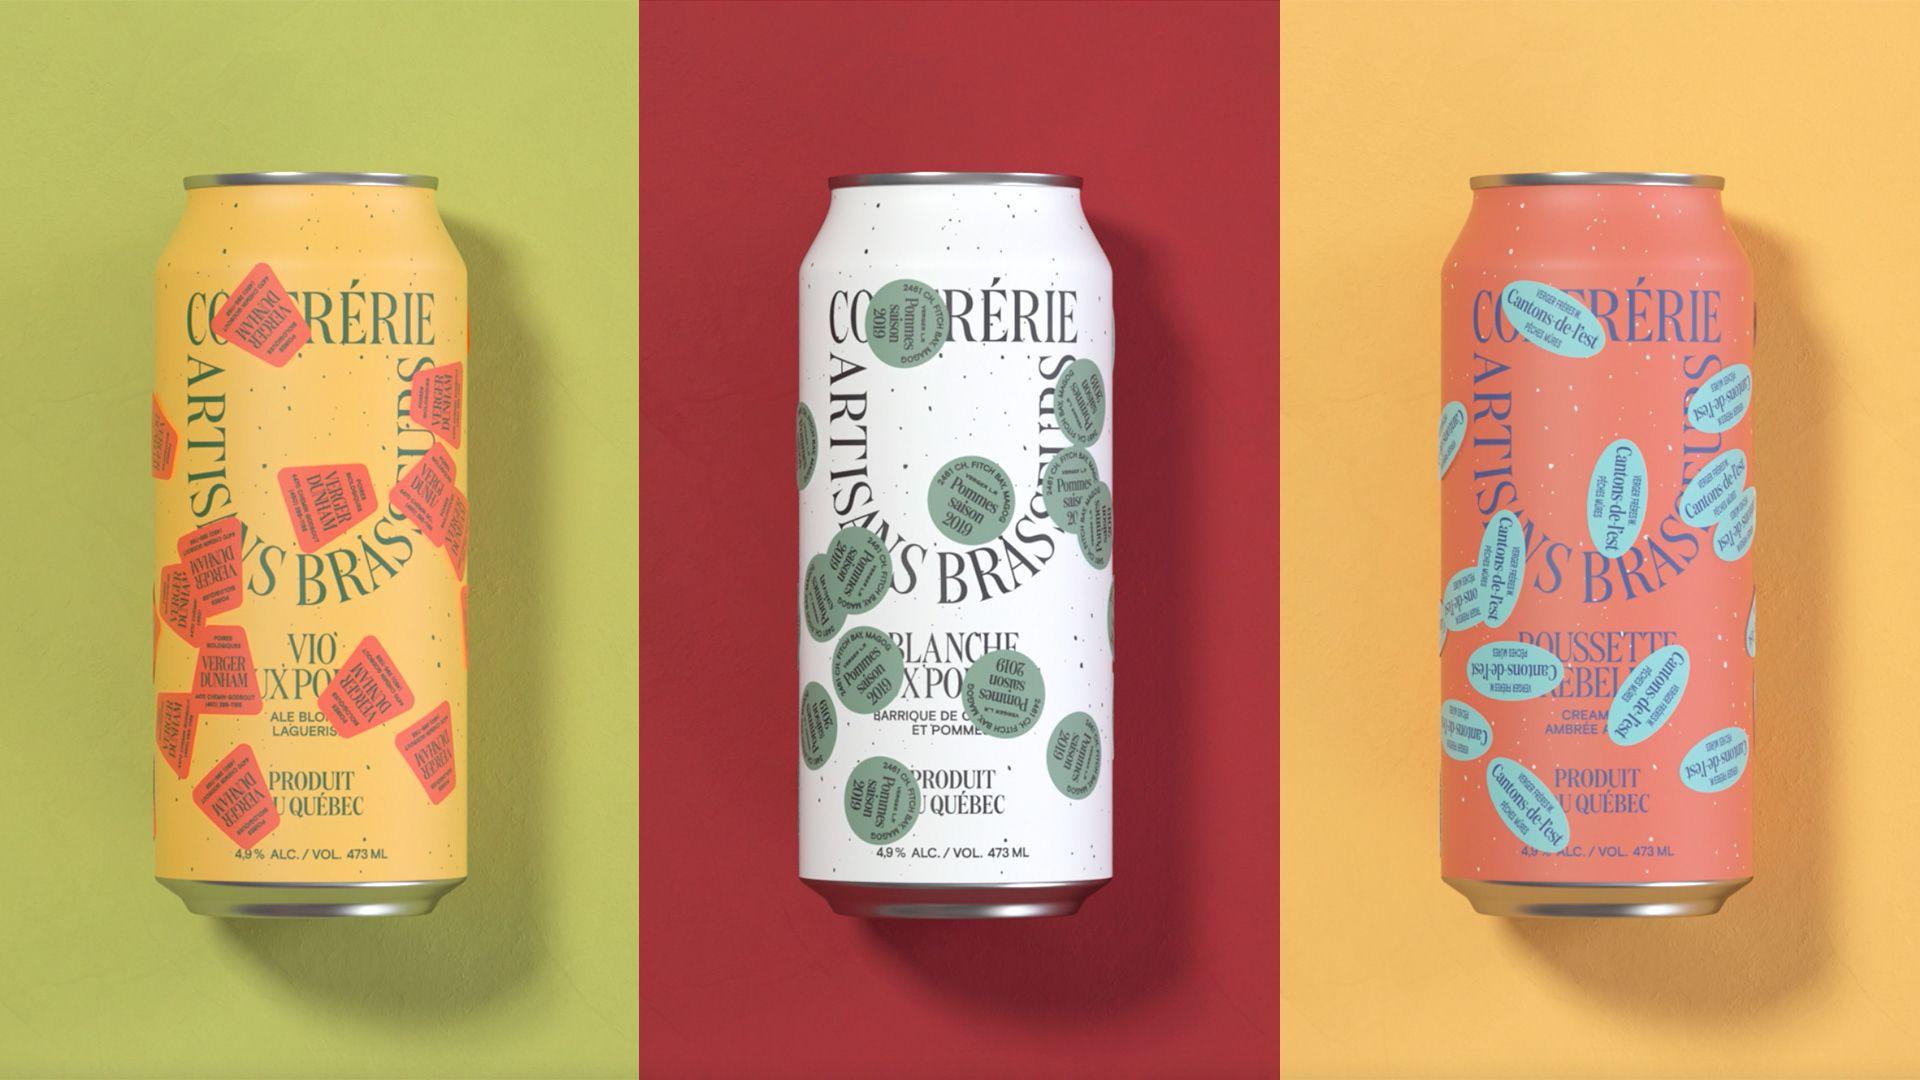 Brewers Confrerie Artisans Brasseurs On Behance In 2020 Flavored Beer Fruit Labels Fruity Drinks